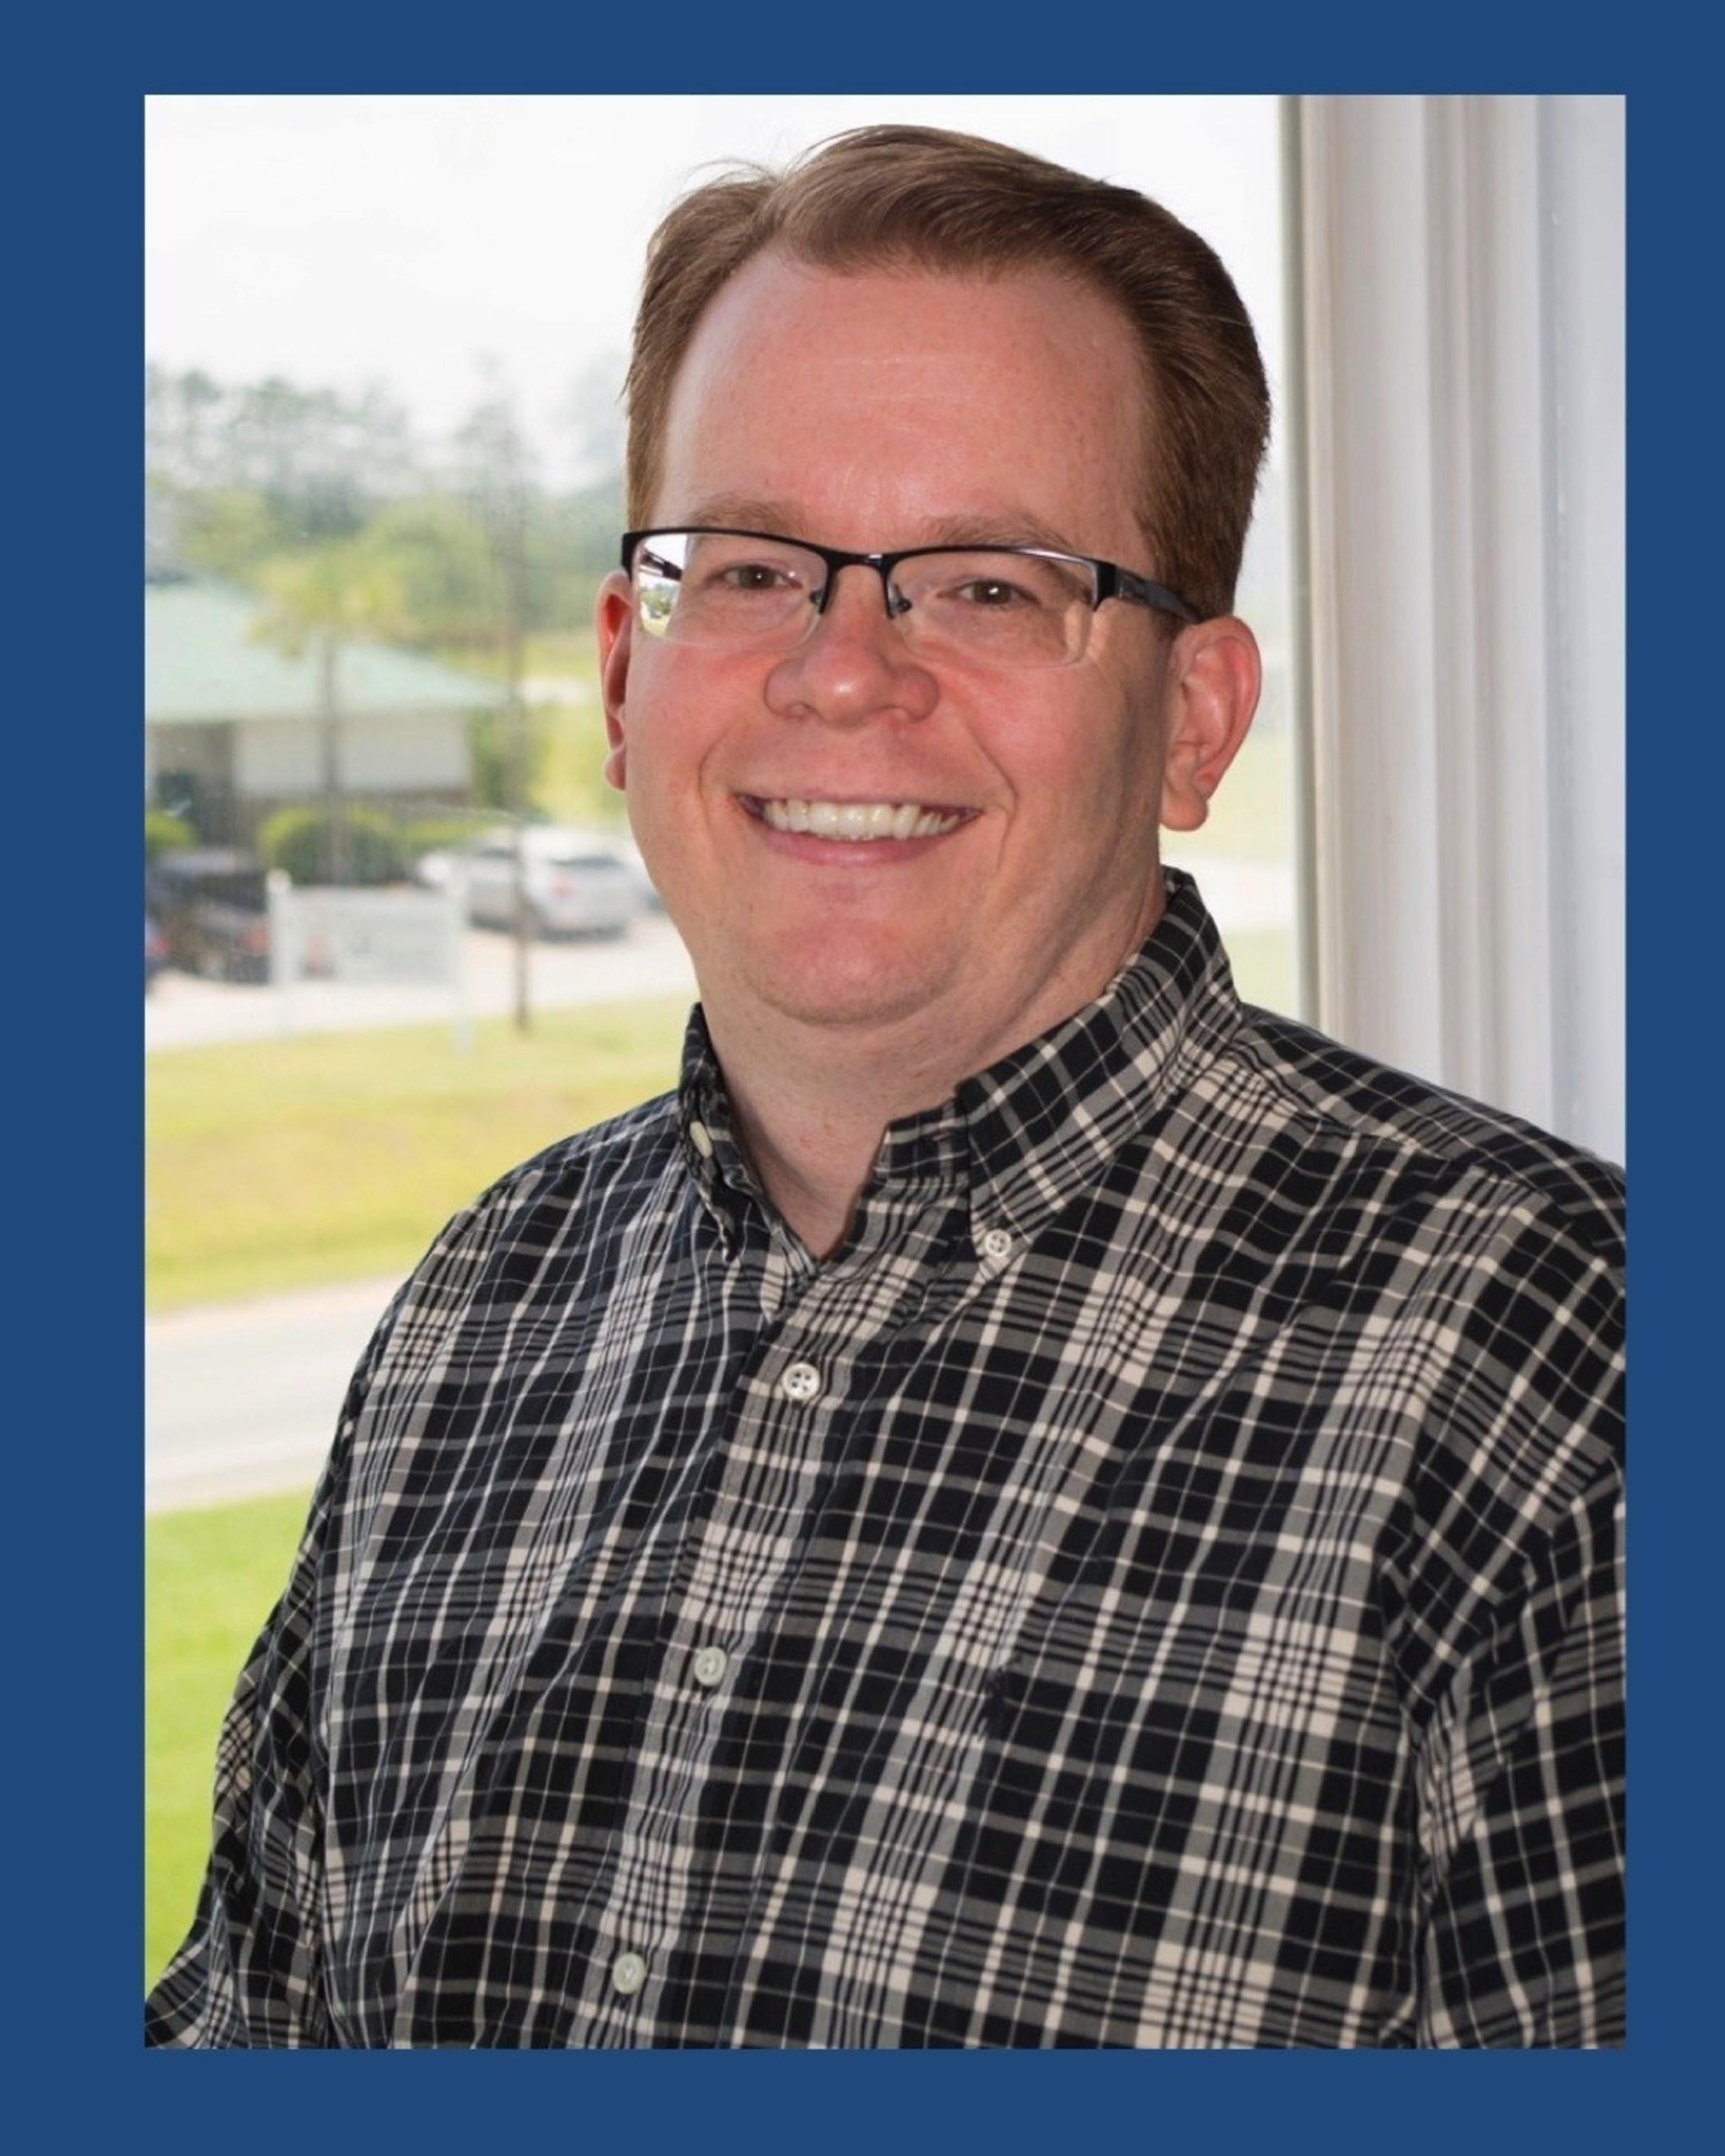 FONU2 Inc. Announces Vice-President of Equipment Rental